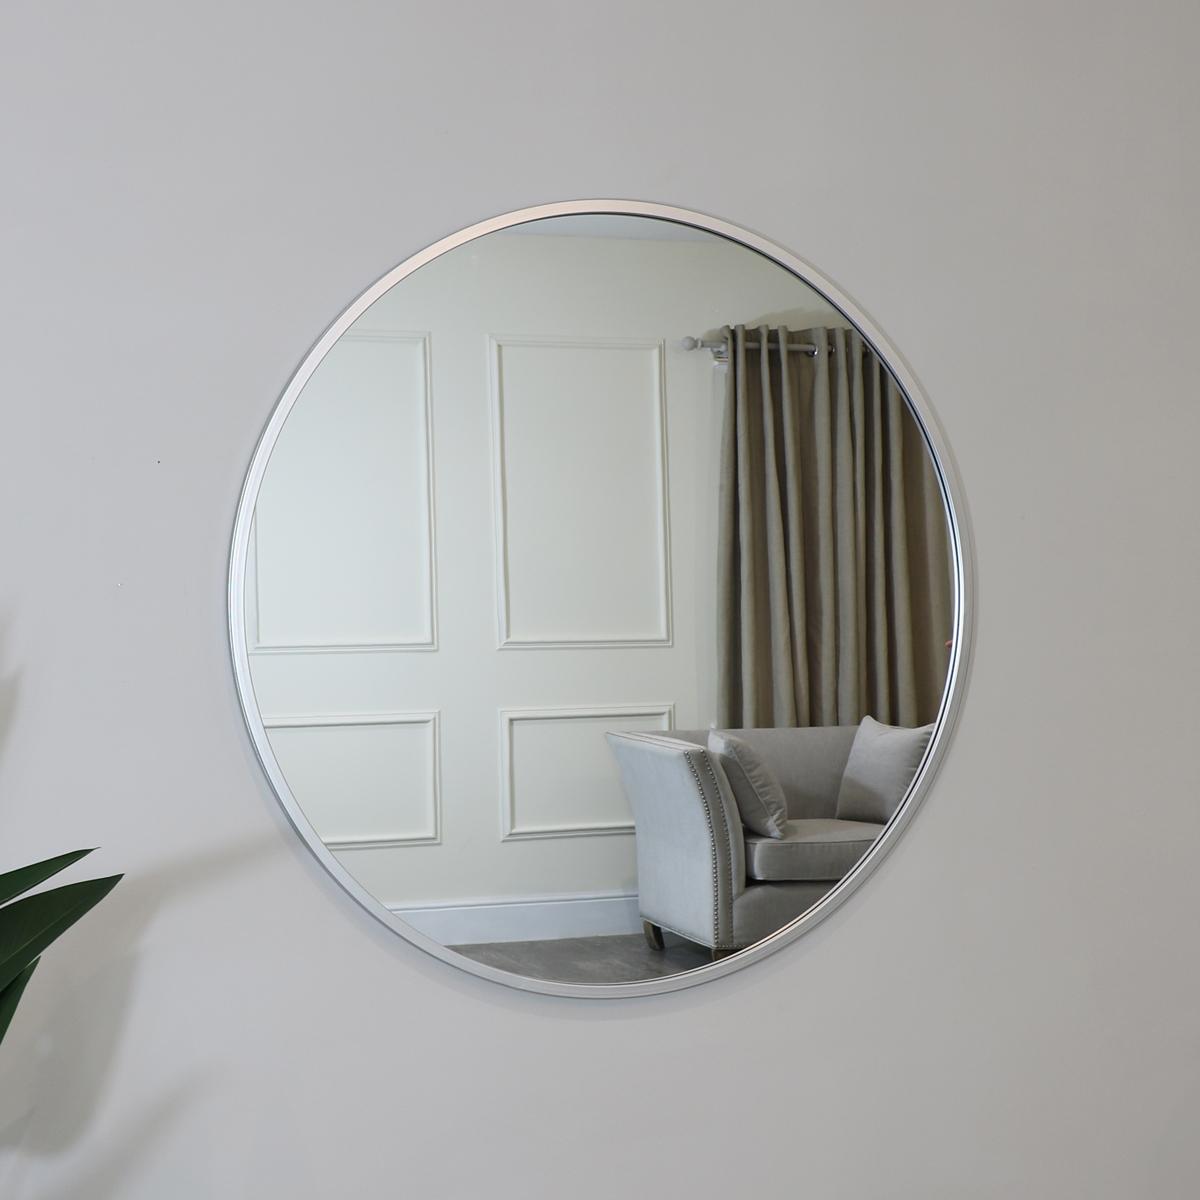 extra-large-round-silver-wall-mirror-120cm-x-120cm_MM29639.jpg